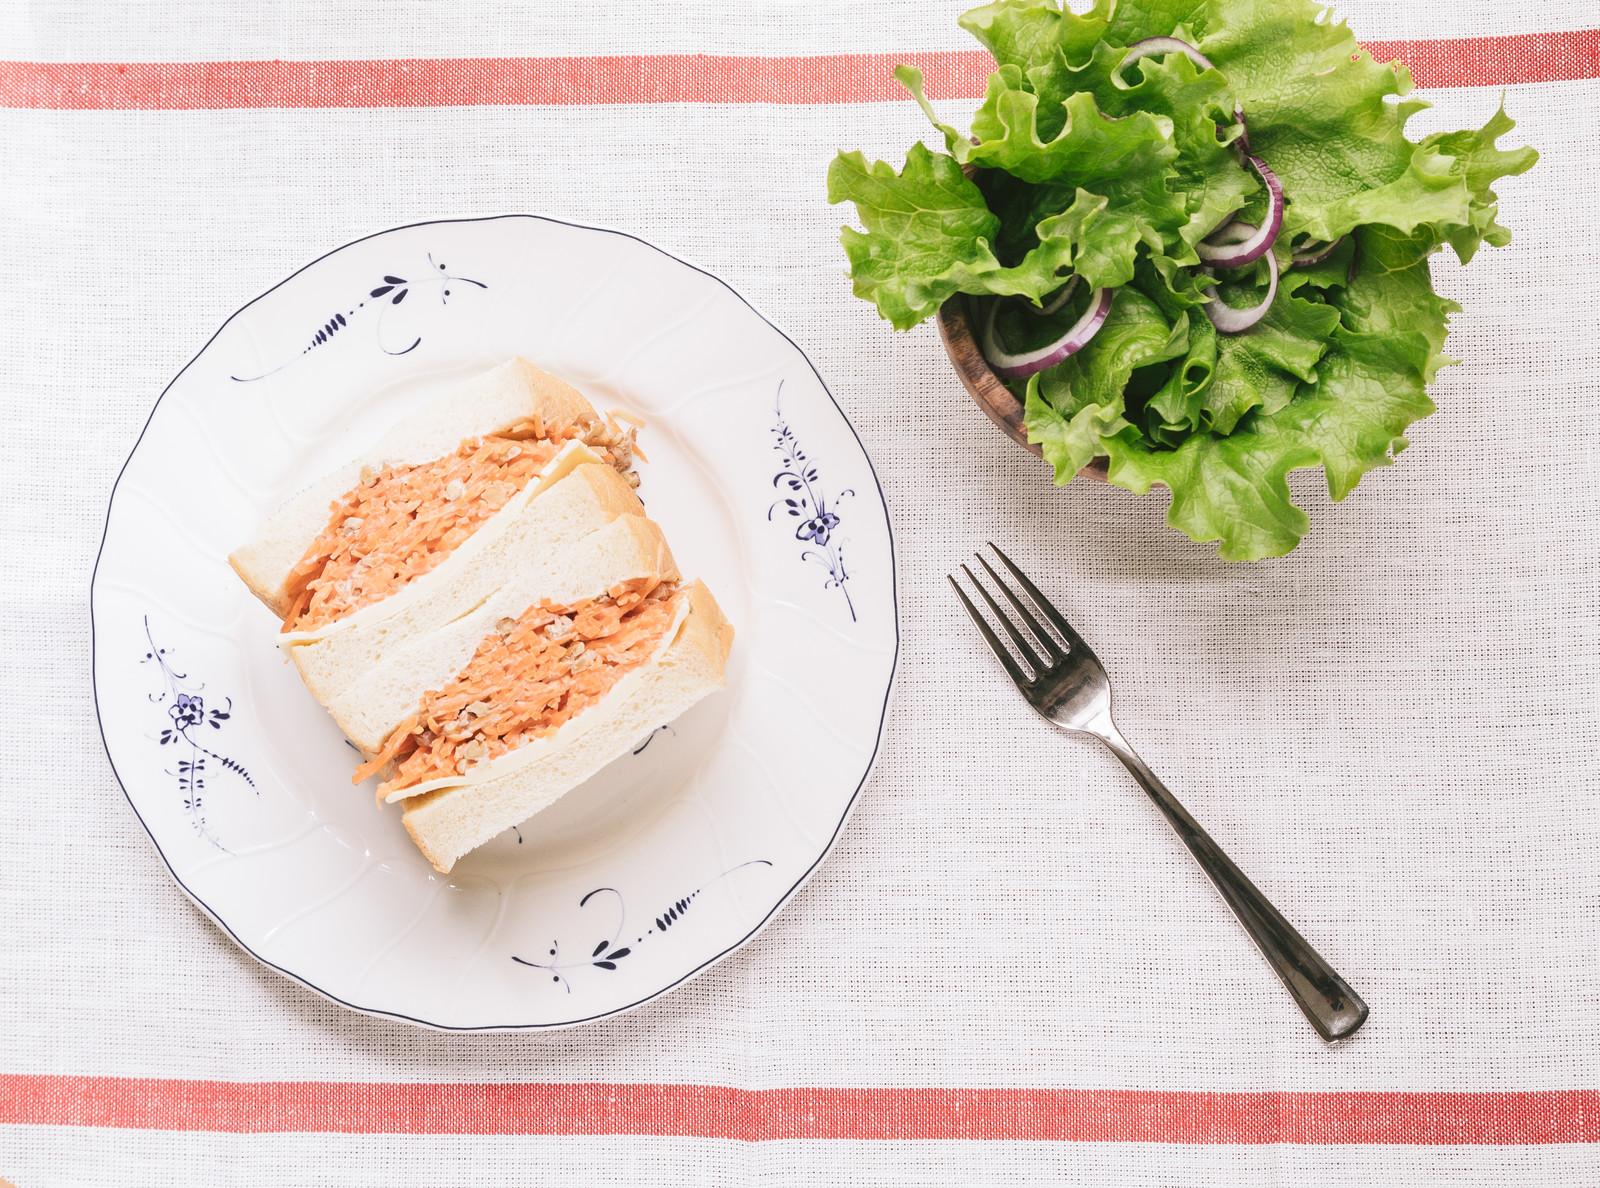 VIKING BAKERY Fは南青山の人気食パン専門店!種類や値段は?